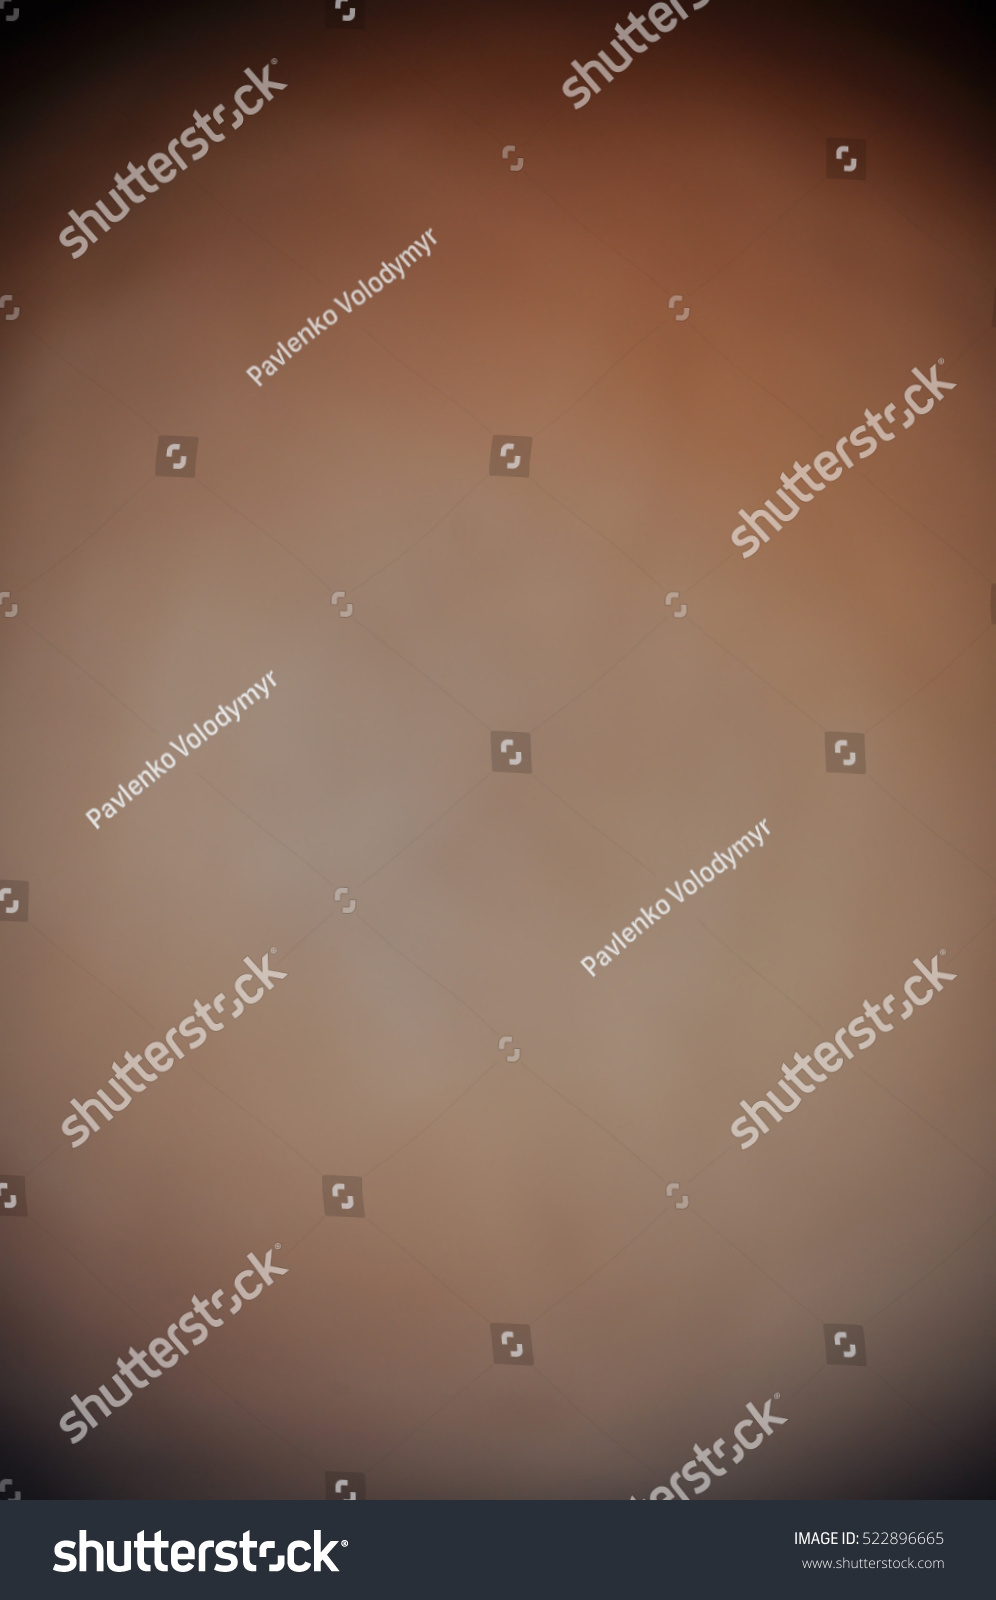 Dirty Dark Brown Background Wallpaper Stock Illustration 522896665 ... for Dark Brown Background Wallpaper  10lpwja